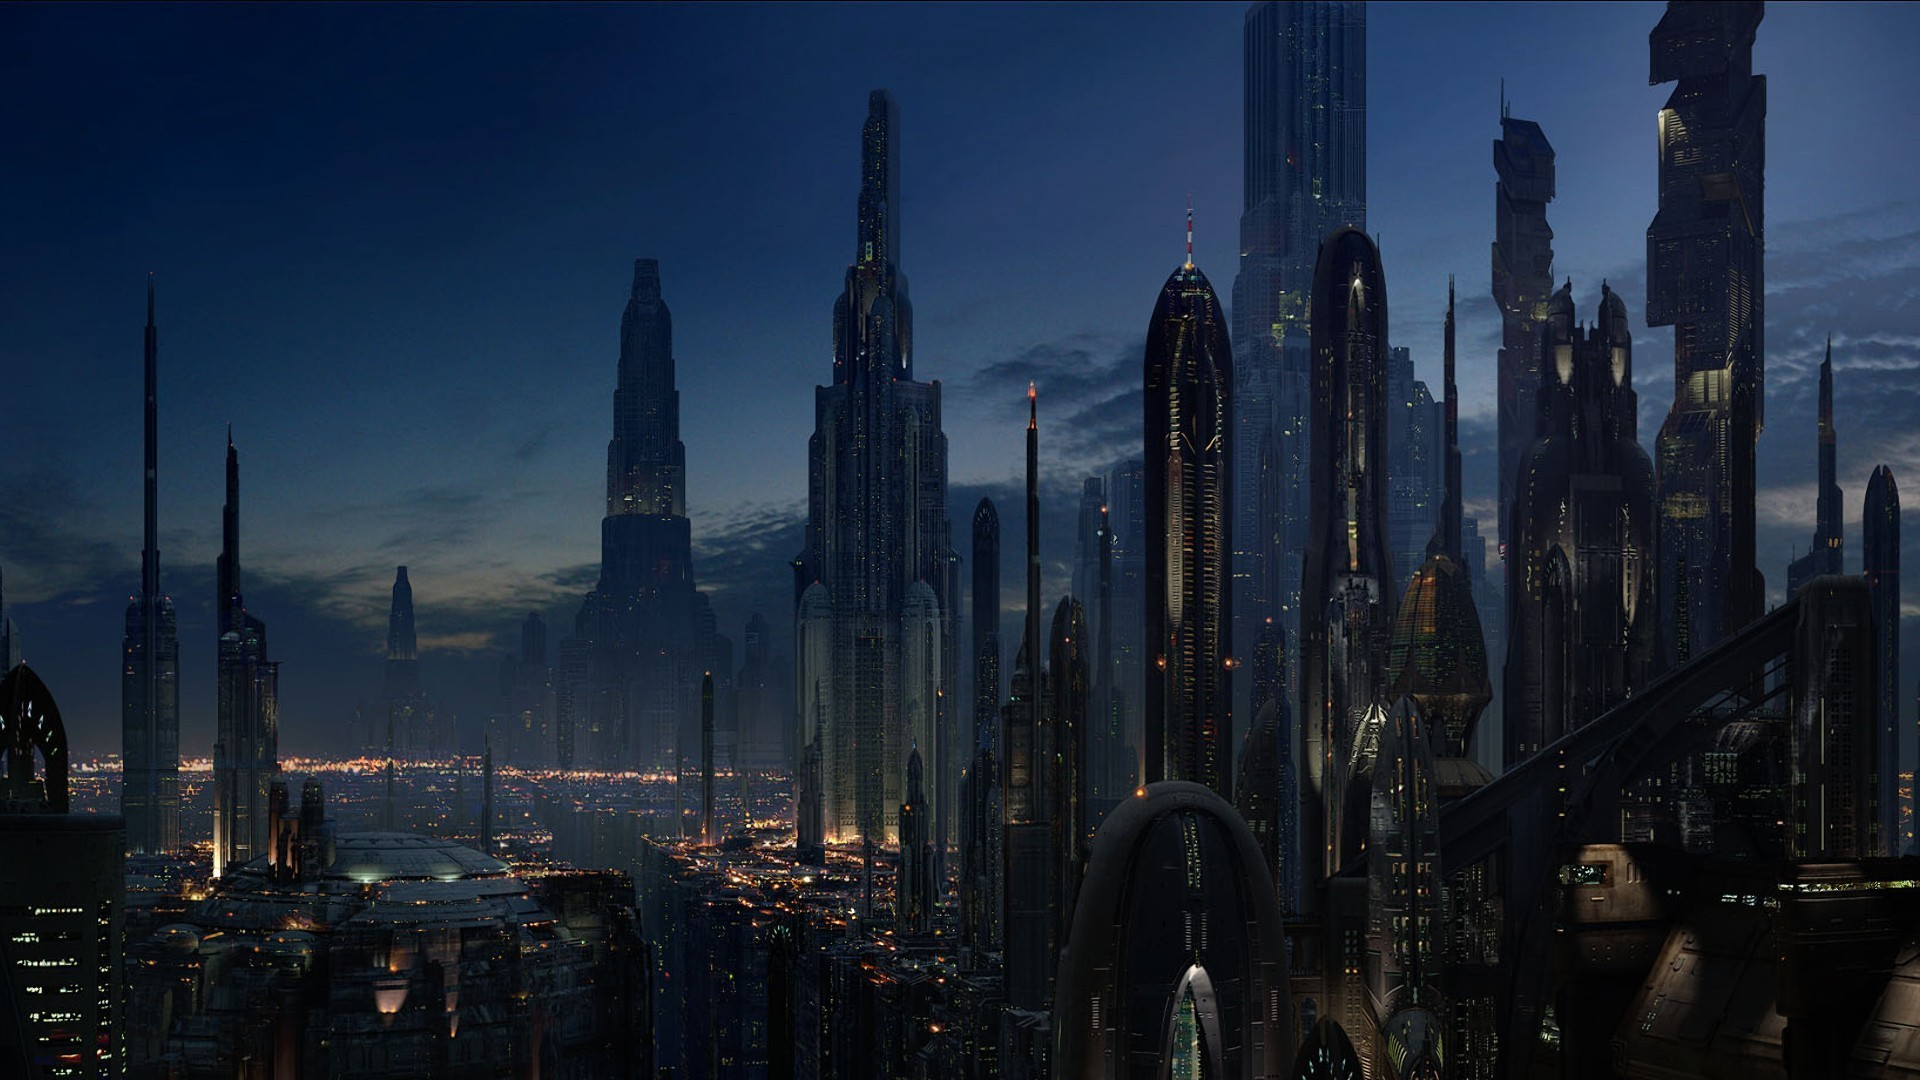 Tags: Star Wars Sith Empire Wallpaper Hd …